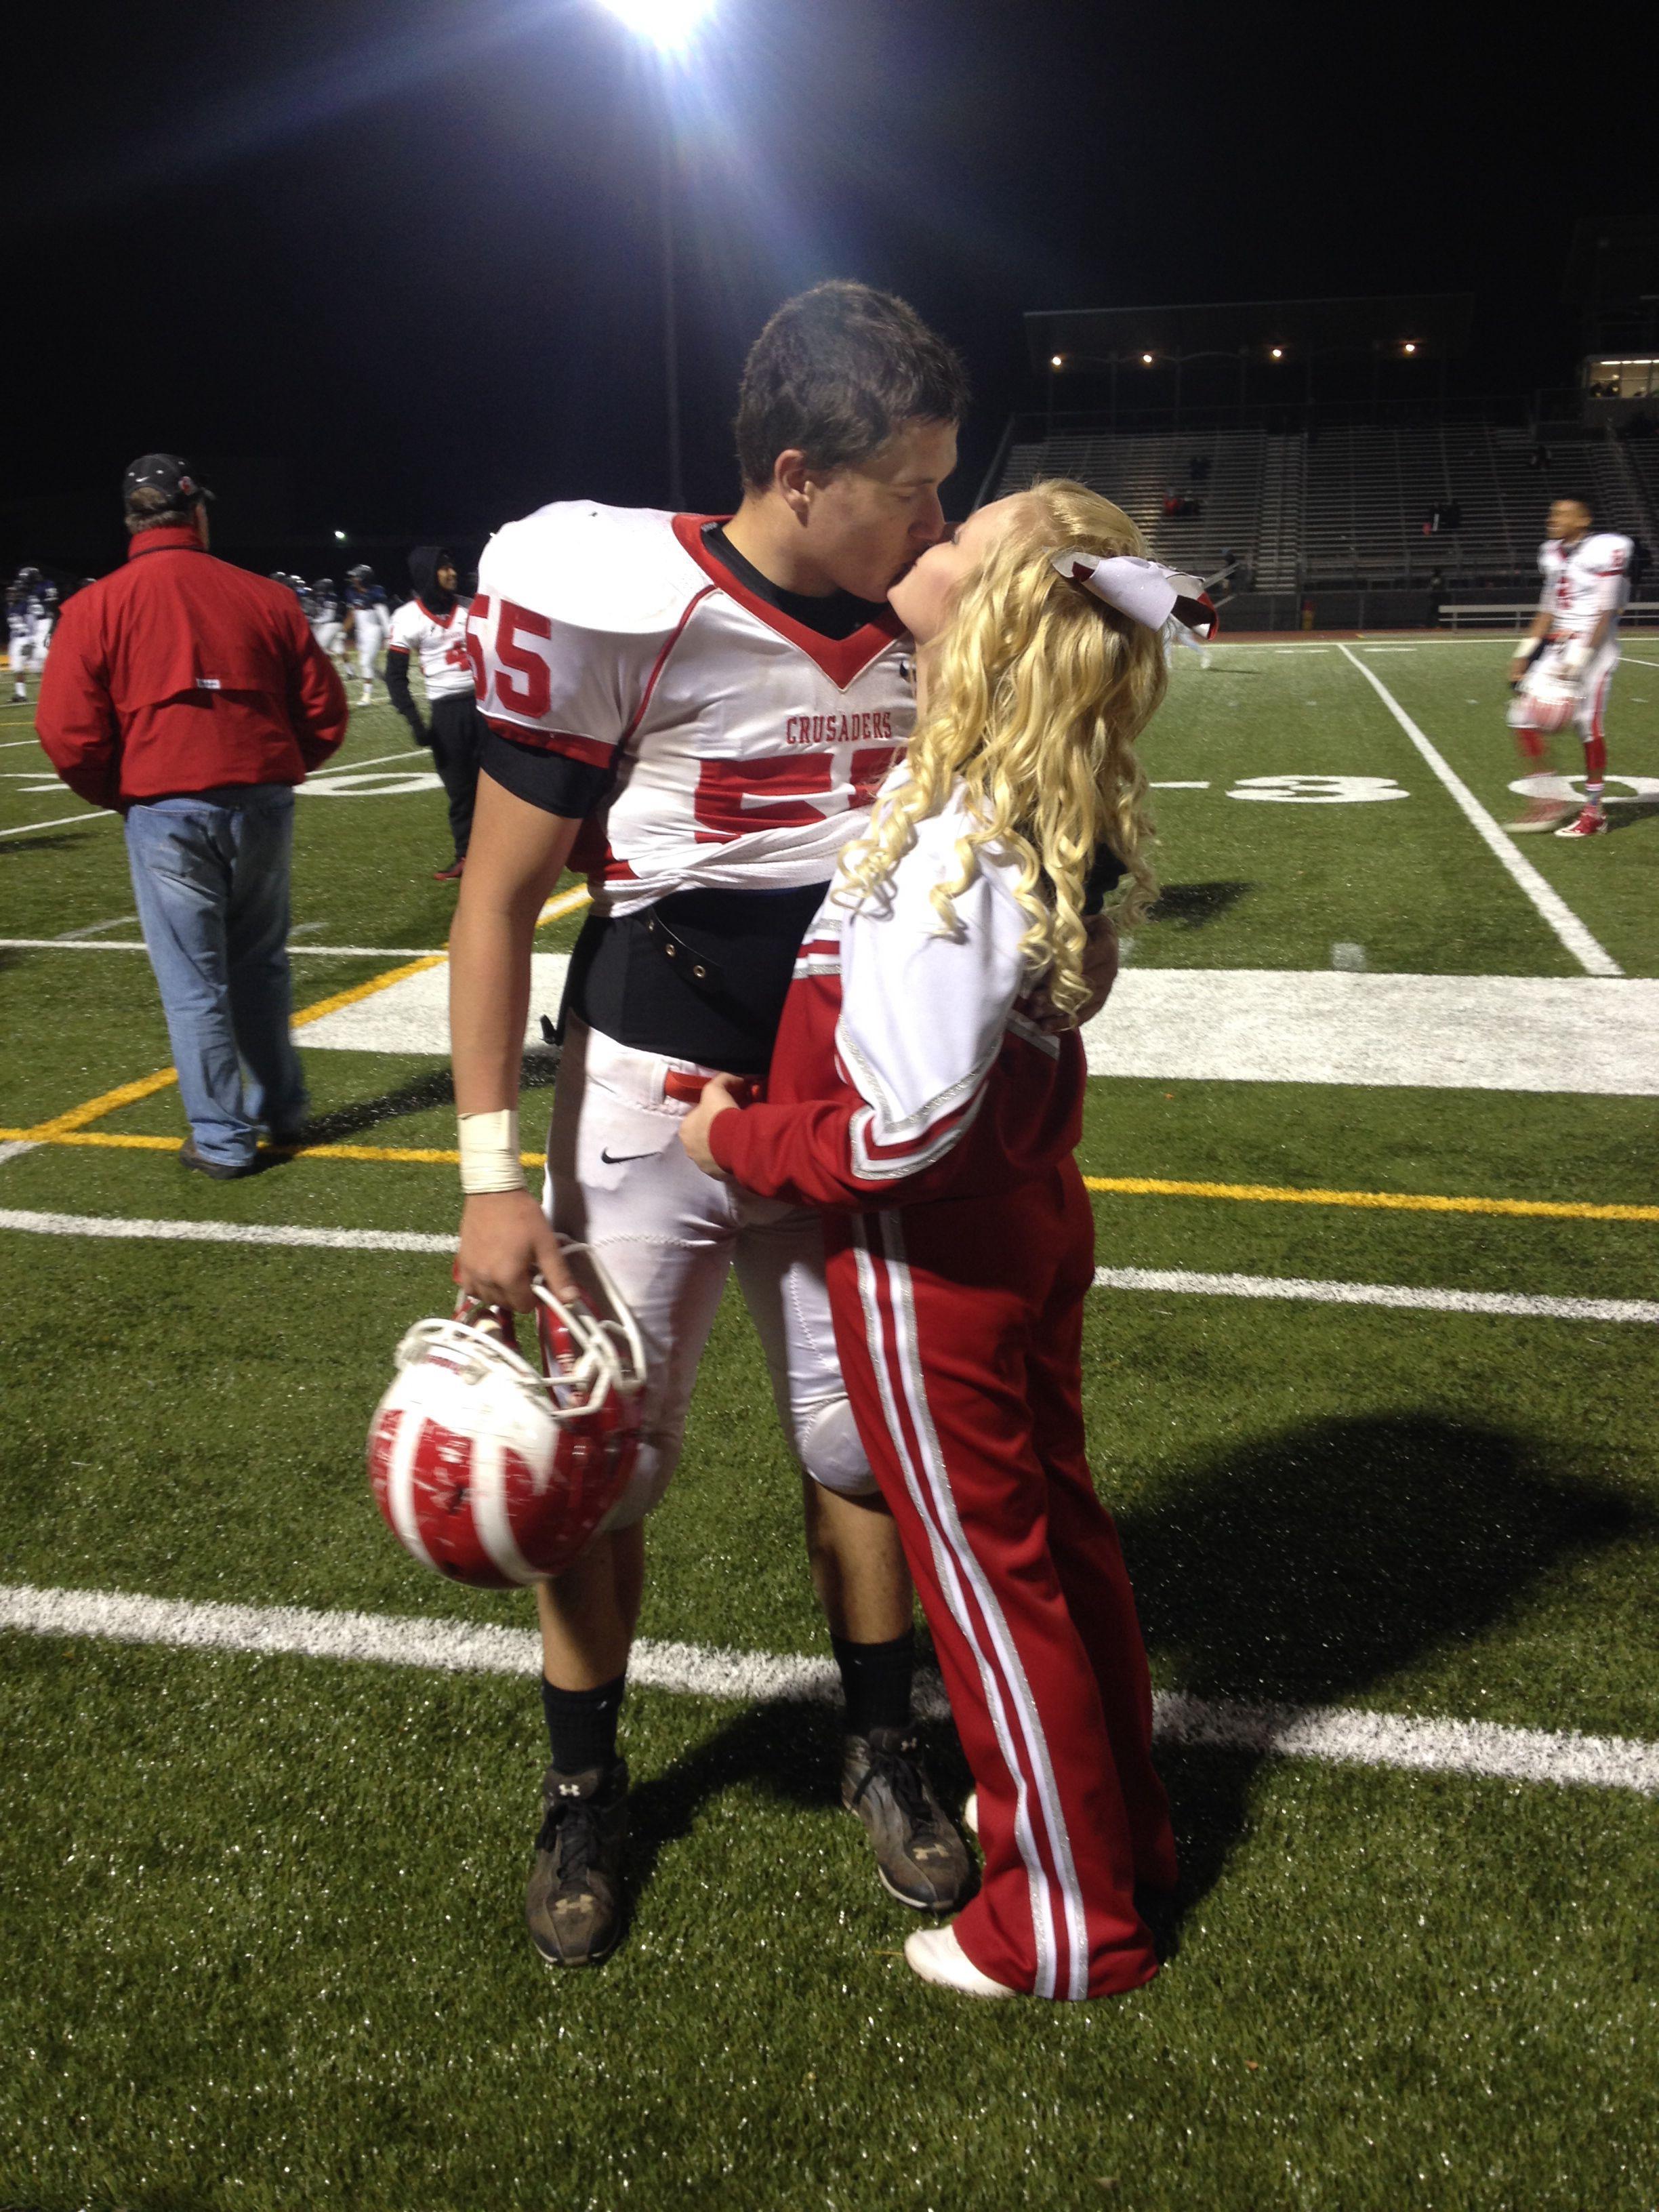 Dallas cheerleader dating football player